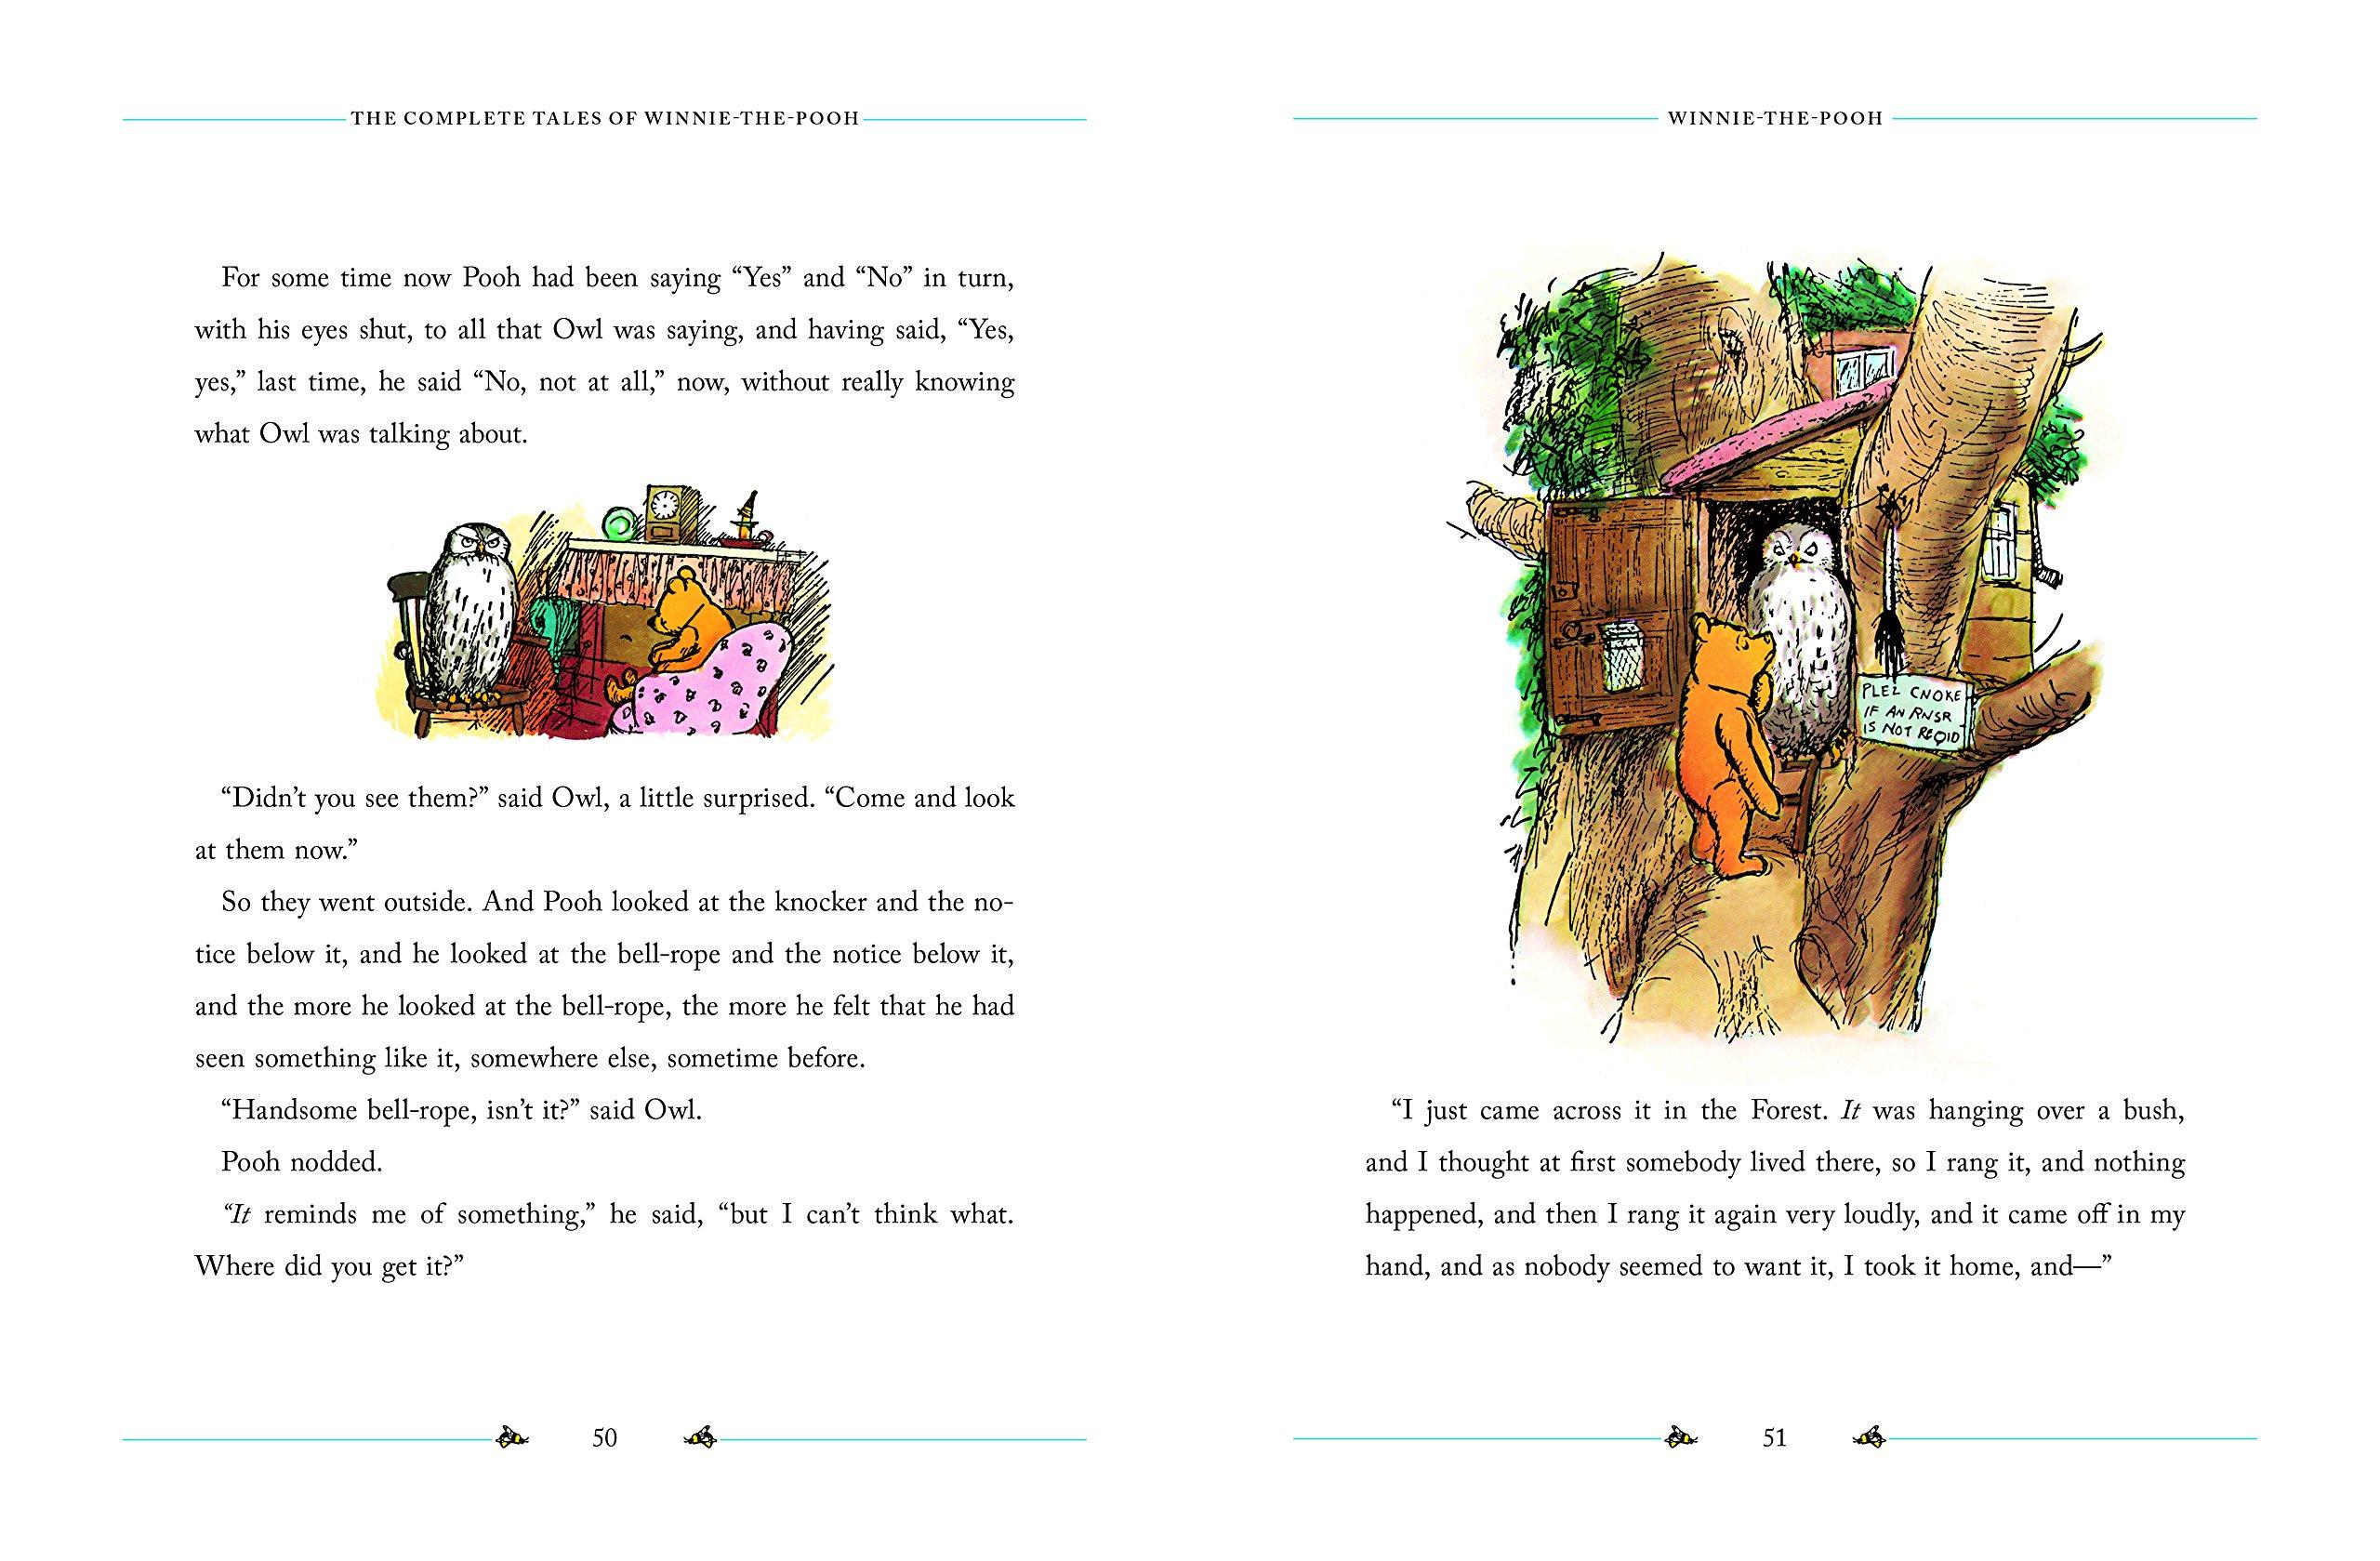 Buy Theplete Tales Of Winniethepooh Book Online At Low Prices In  India  Theplete Tales Of Winniethepooh Reviews & Ratings  Amazon